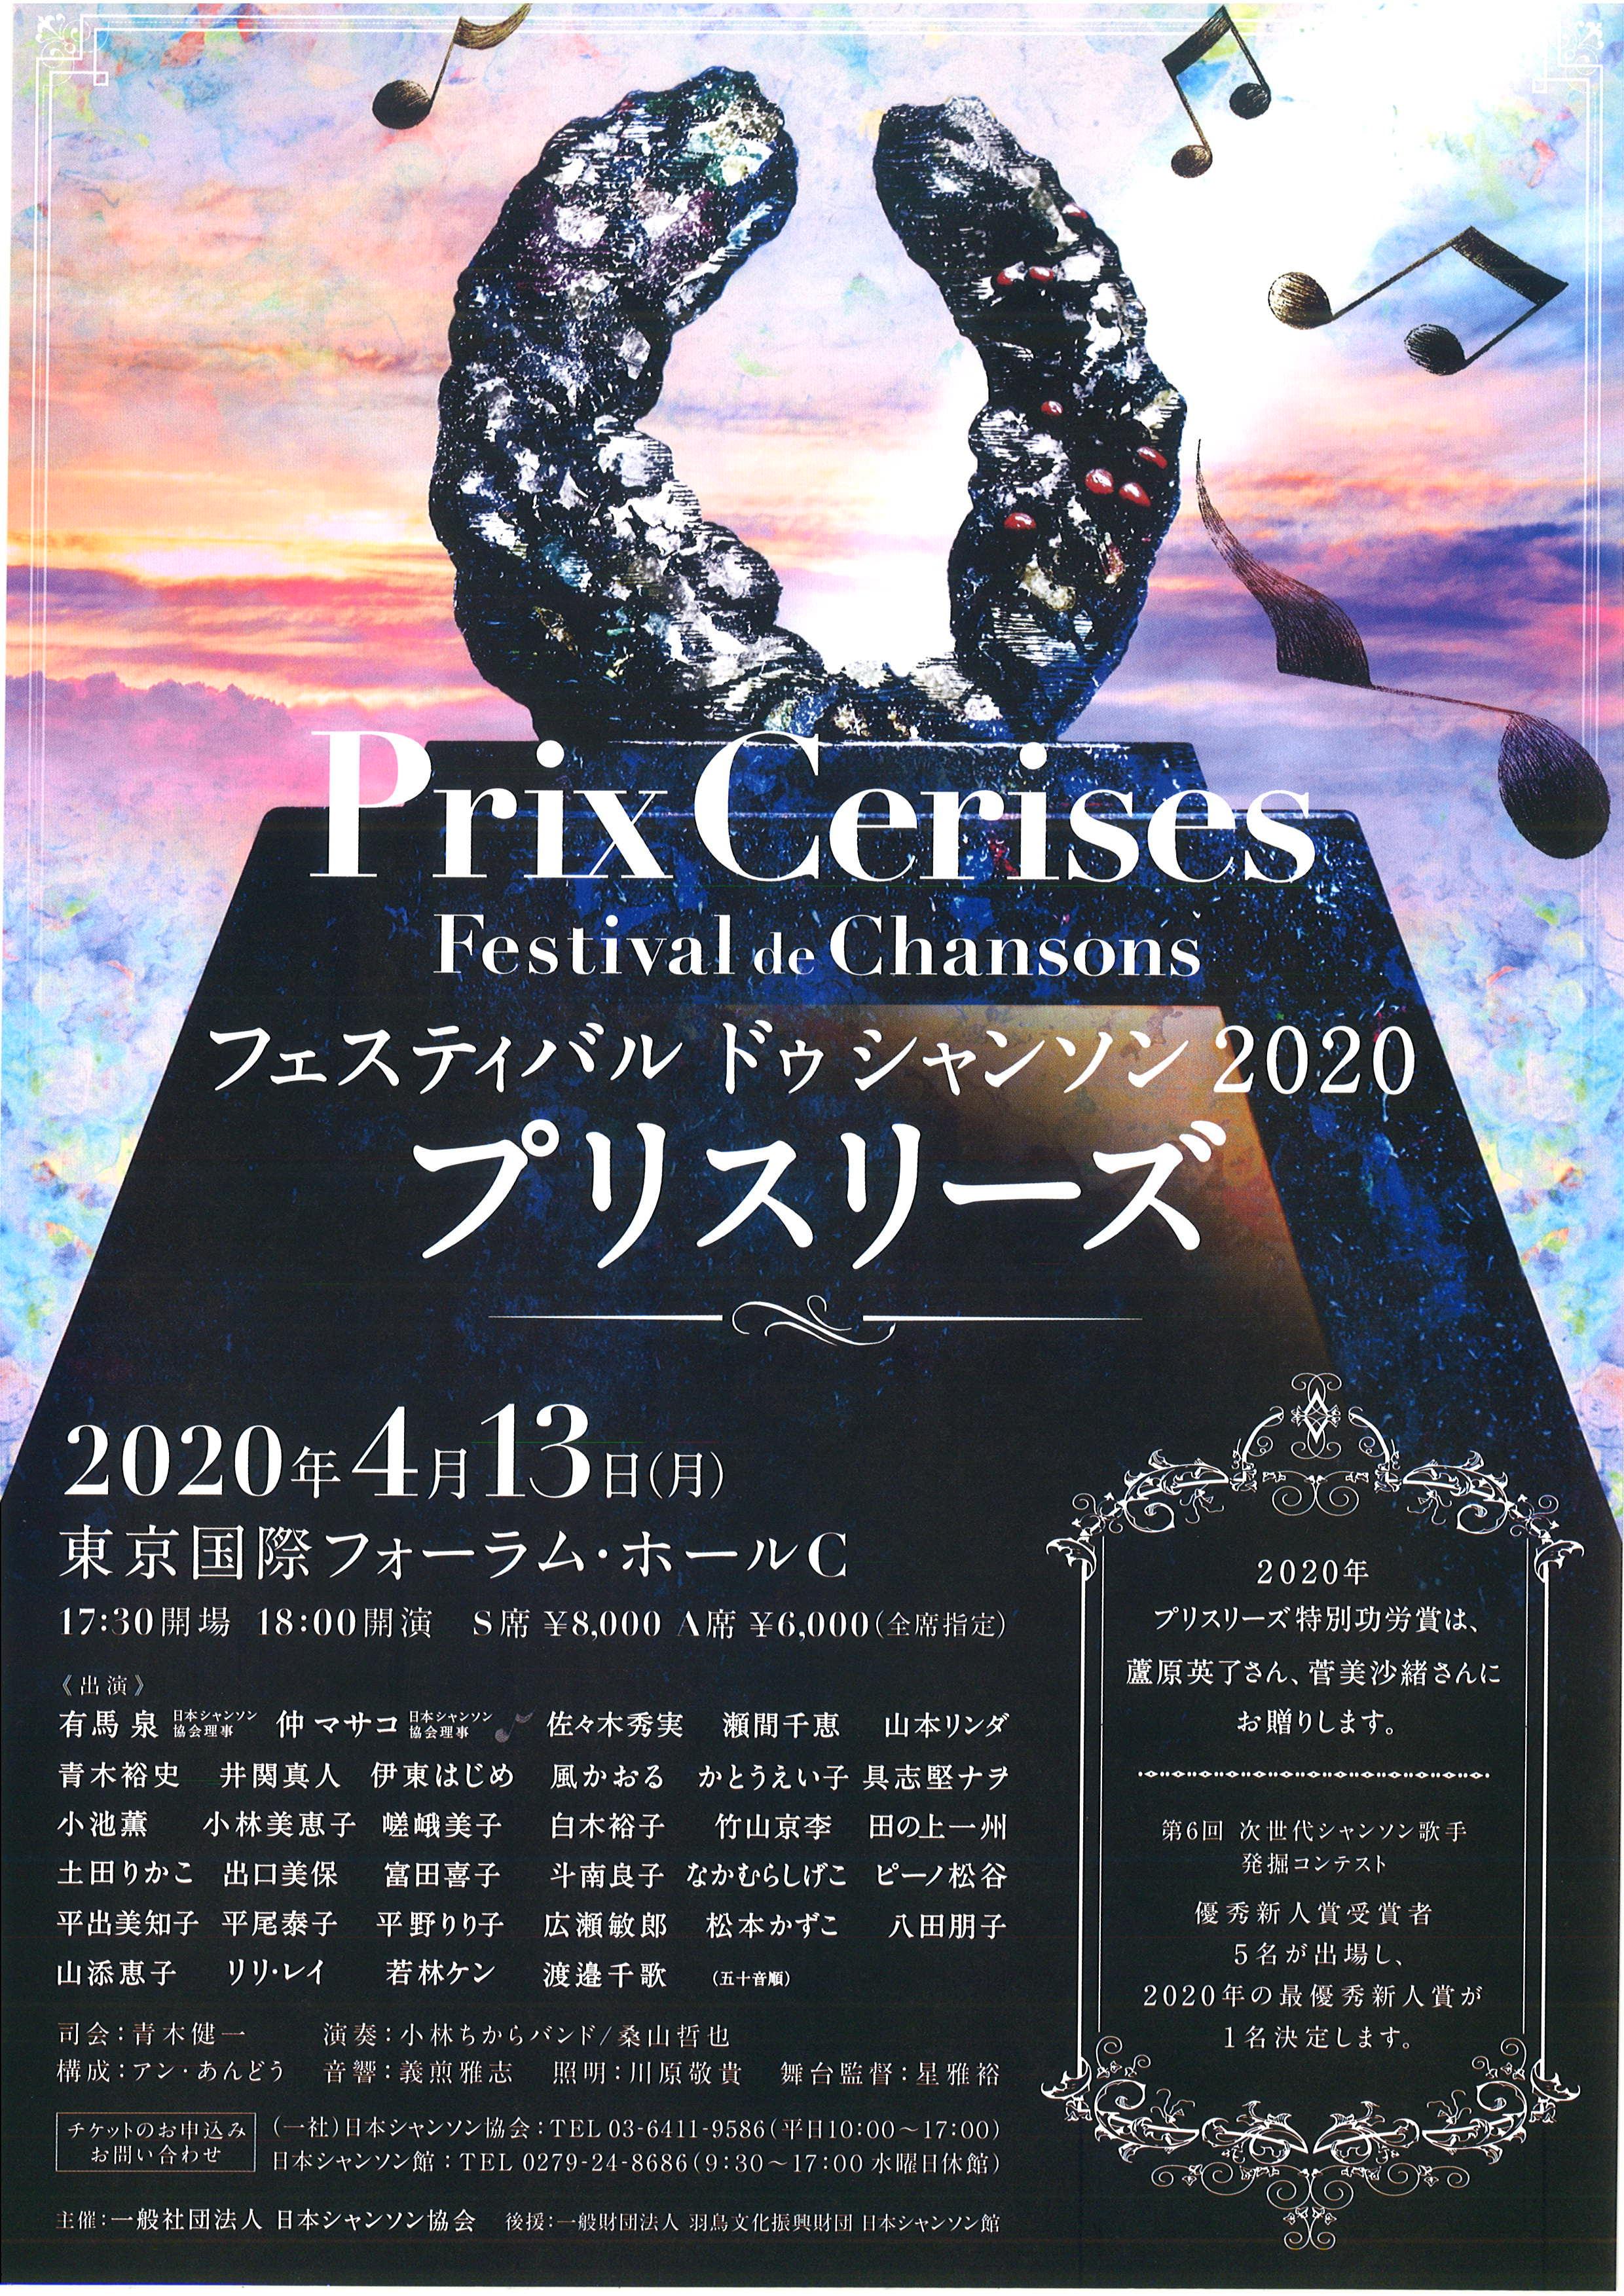 PrixCerises Festival de Chansons2020.jpg